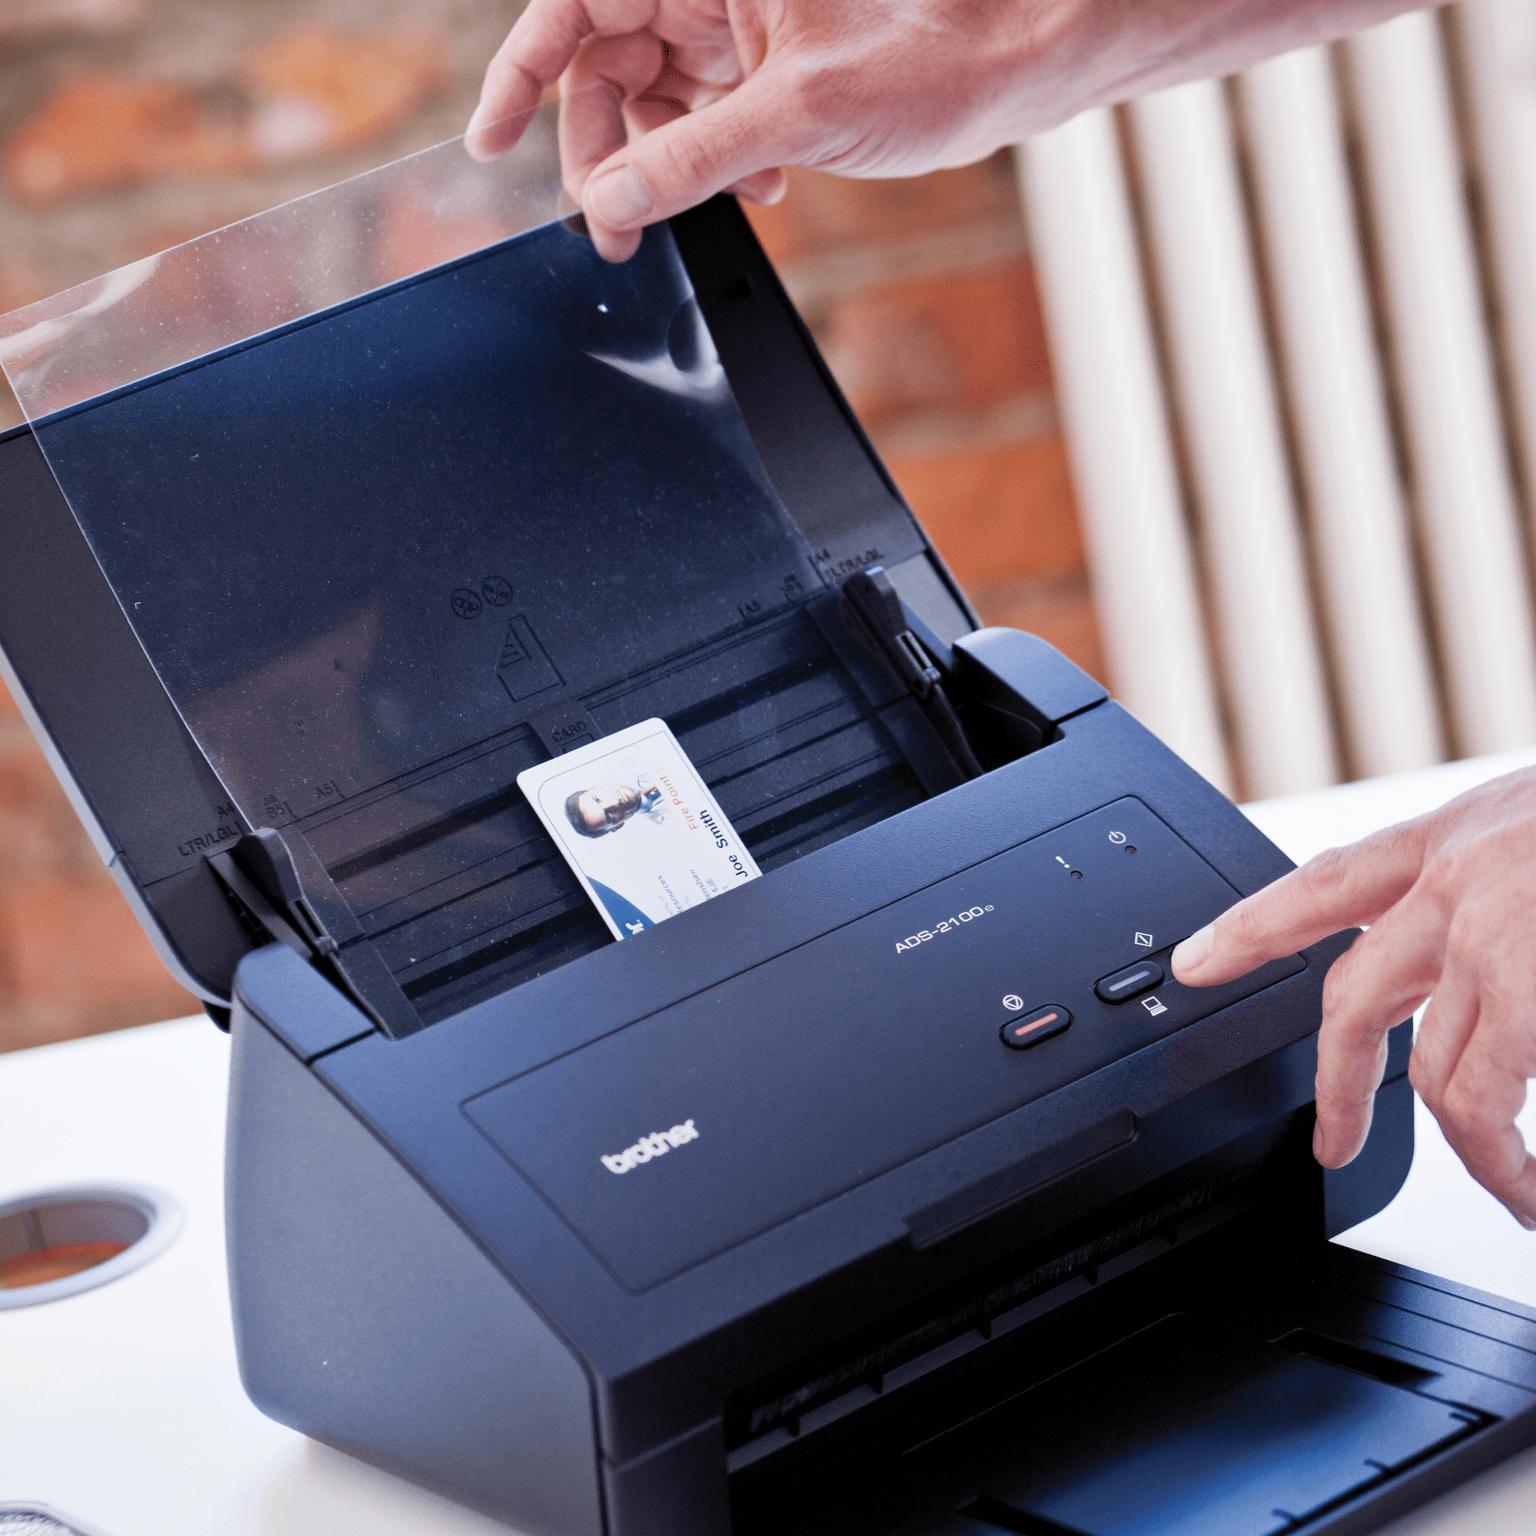 Logiciel ABBYY pour les scanners | brother